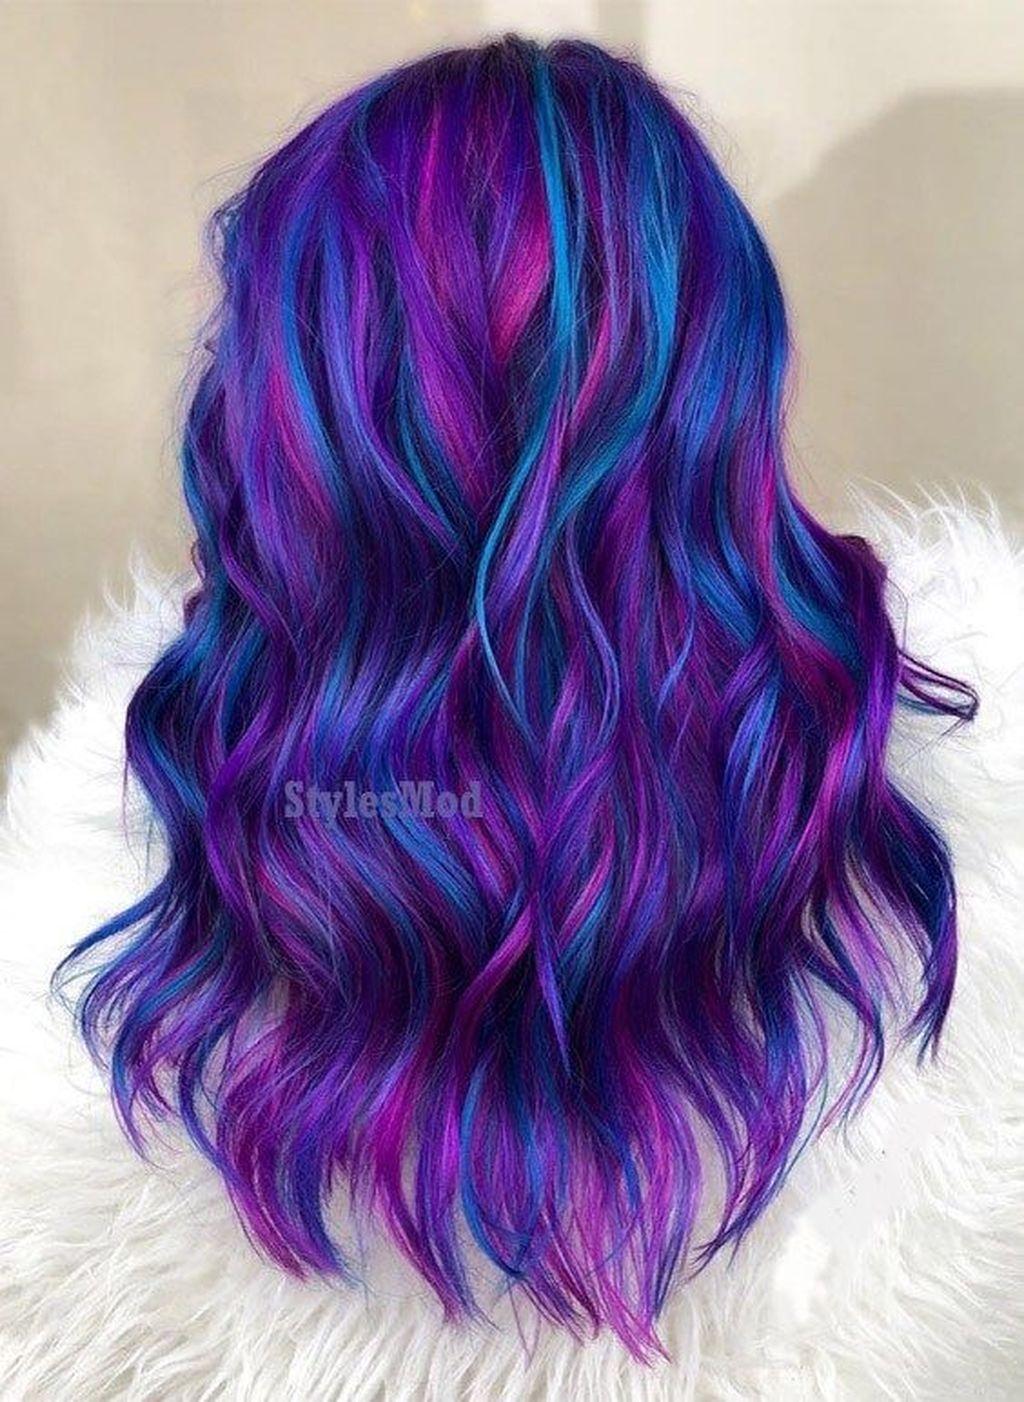 36 Stylish Hair Color Ideas In 2019